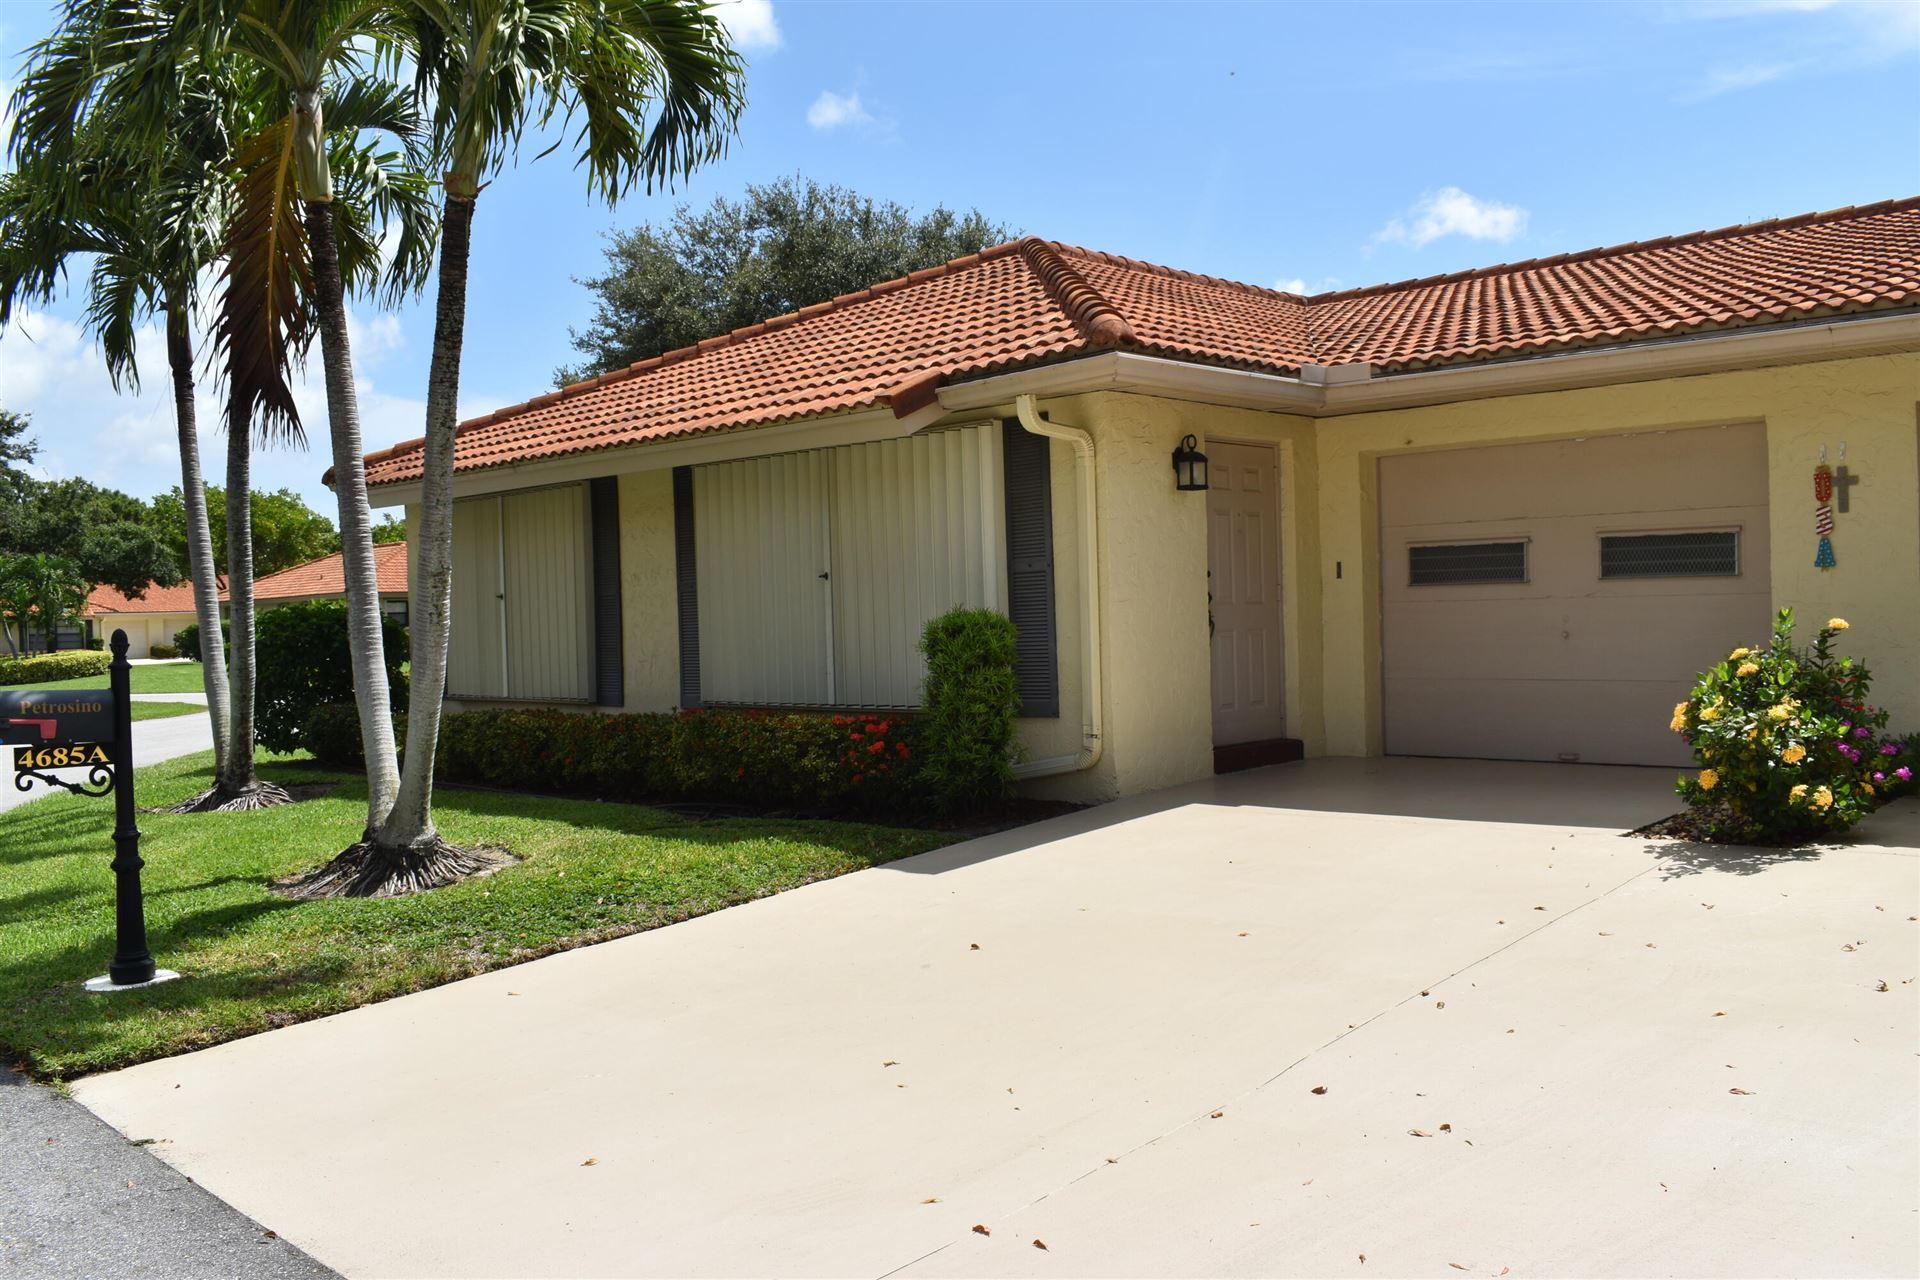 Photo of 4685 Rosewood Tree Court #A, Boynton Beach, FL 33436 (MLS # RX-10733541)